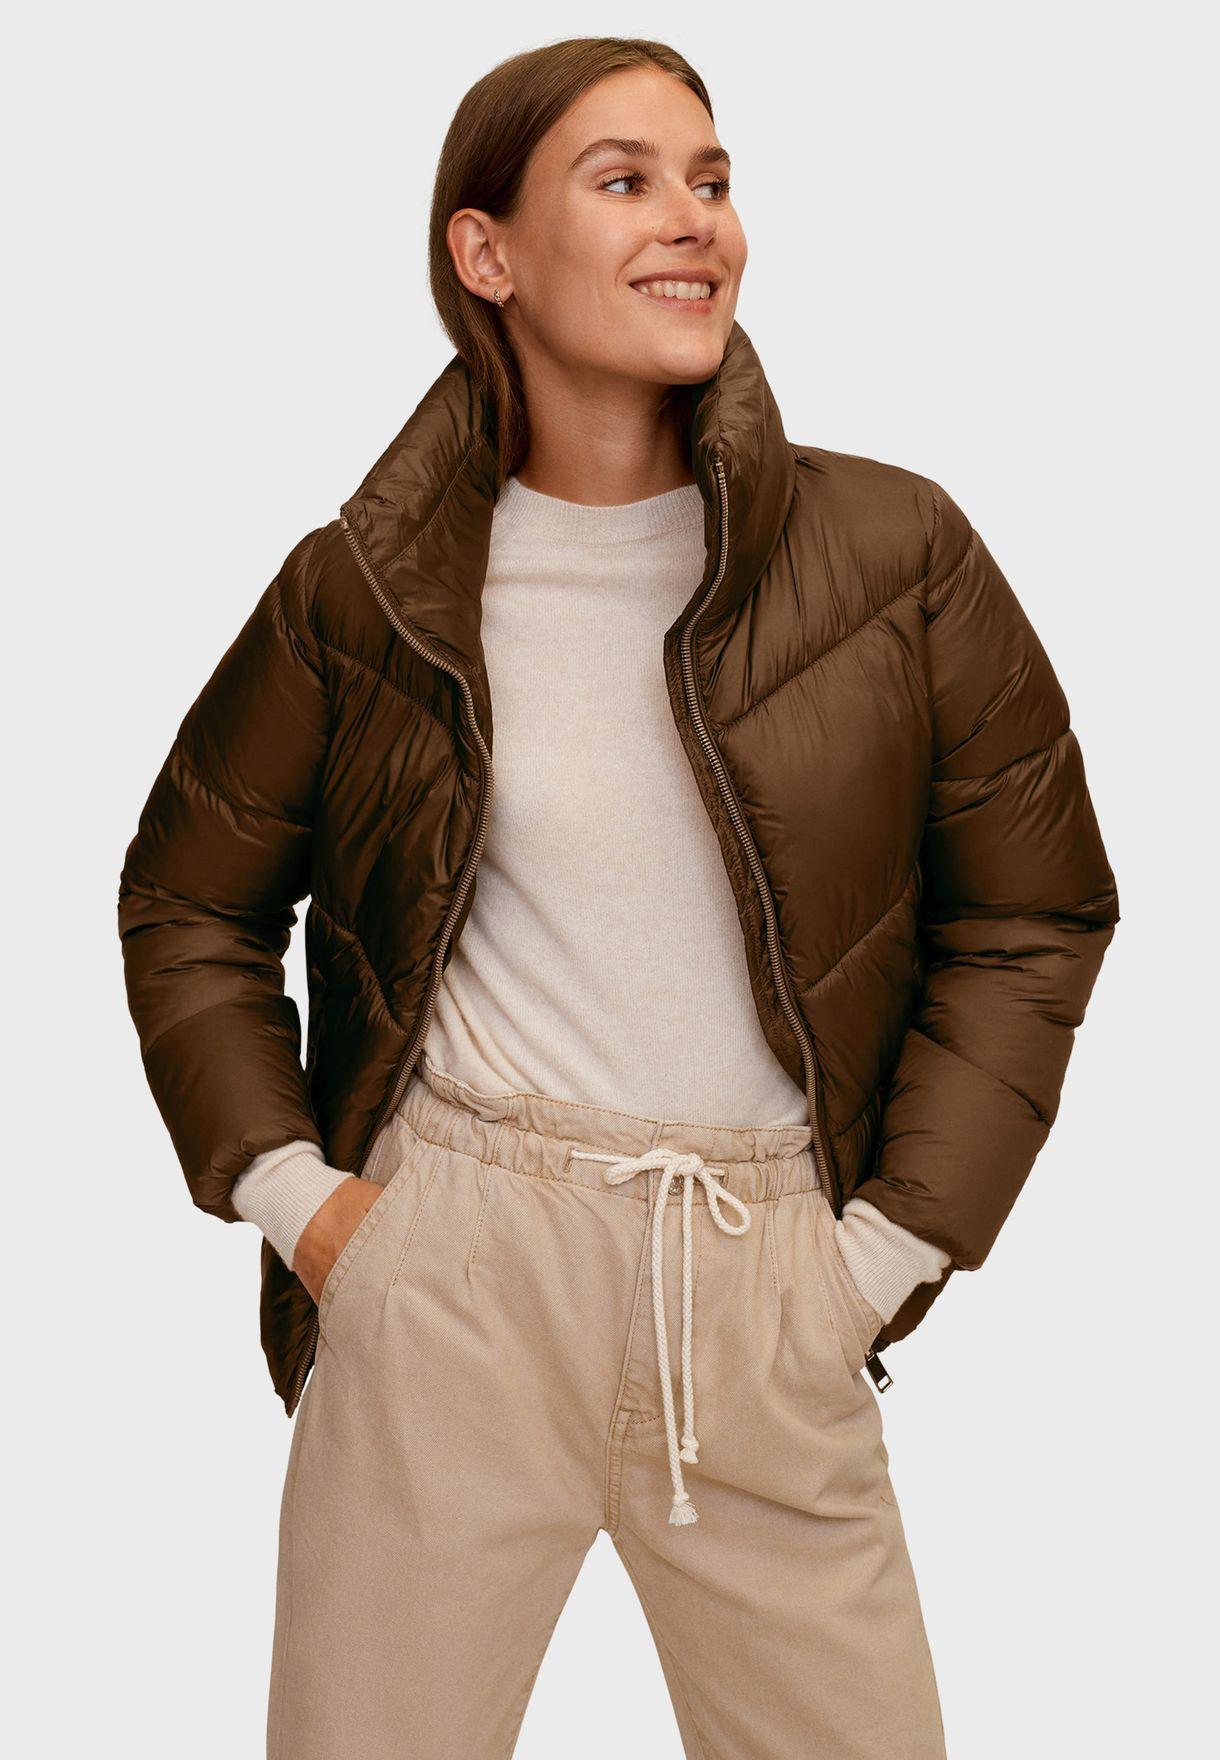 Buy Mango Brown Puffer Jacket For Women In Mena Worldwide 77075902